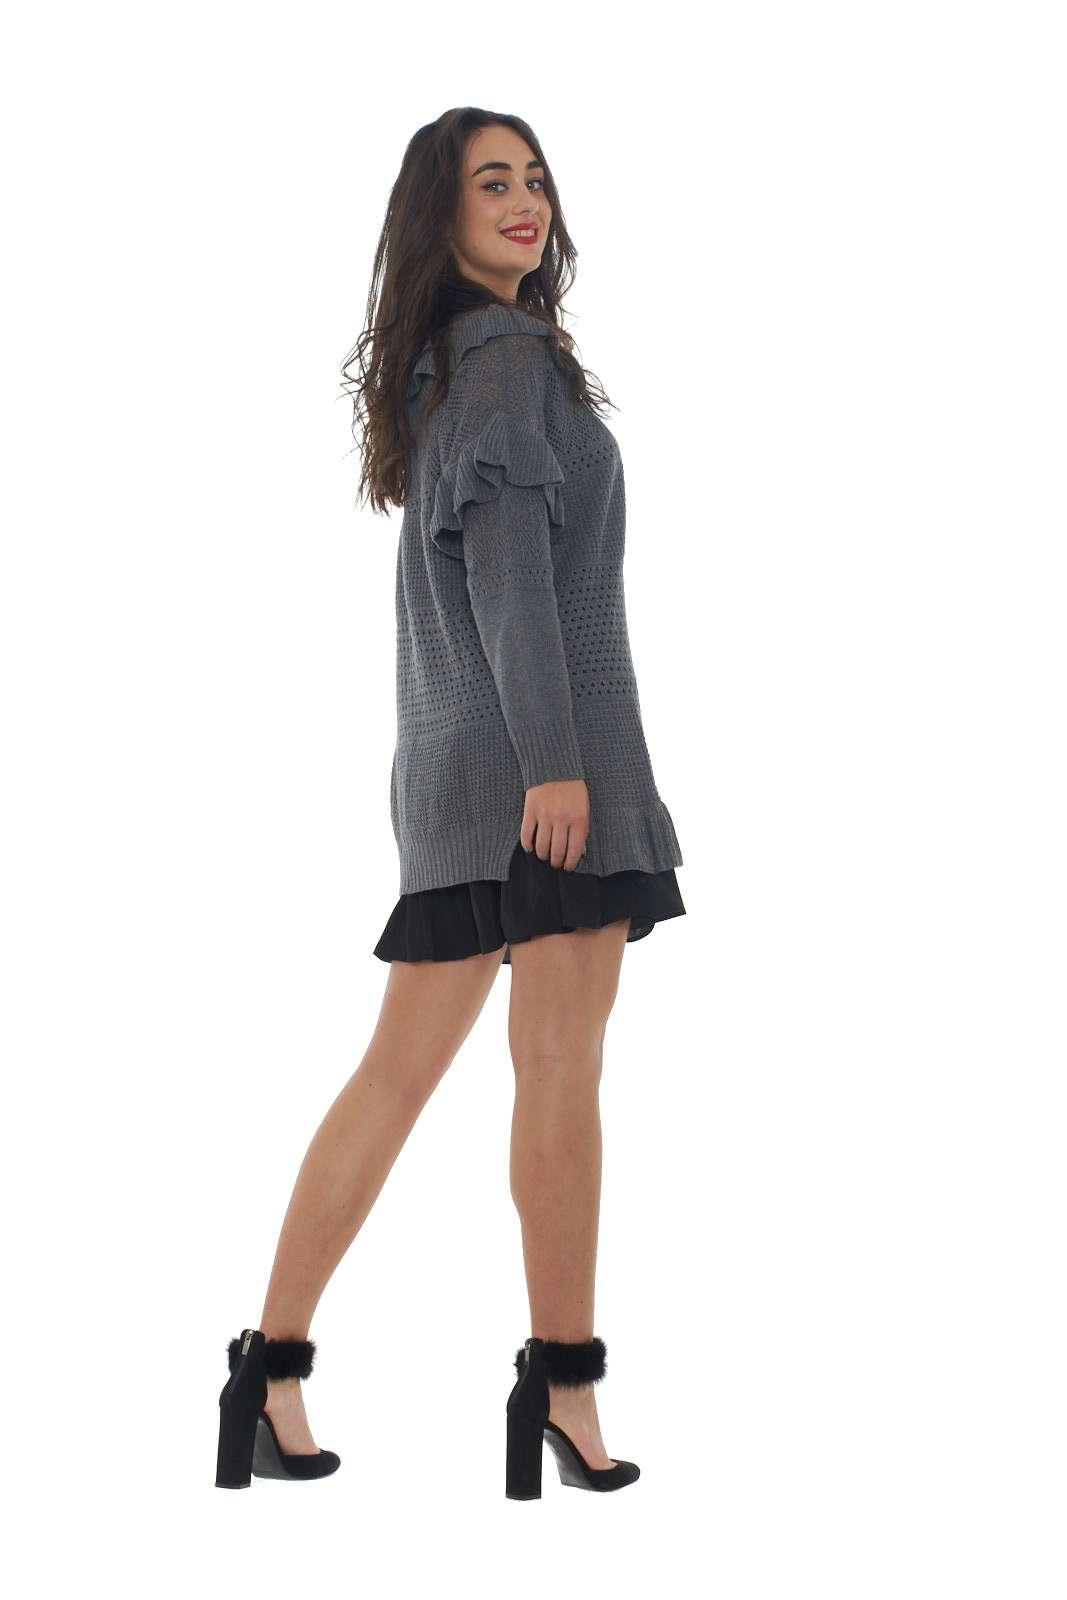 https://www.parmax.com/media/catalog/product/a/i/AI-outlet_parmax-abito-donna-Twin-Set-192TP3200-C.jpg